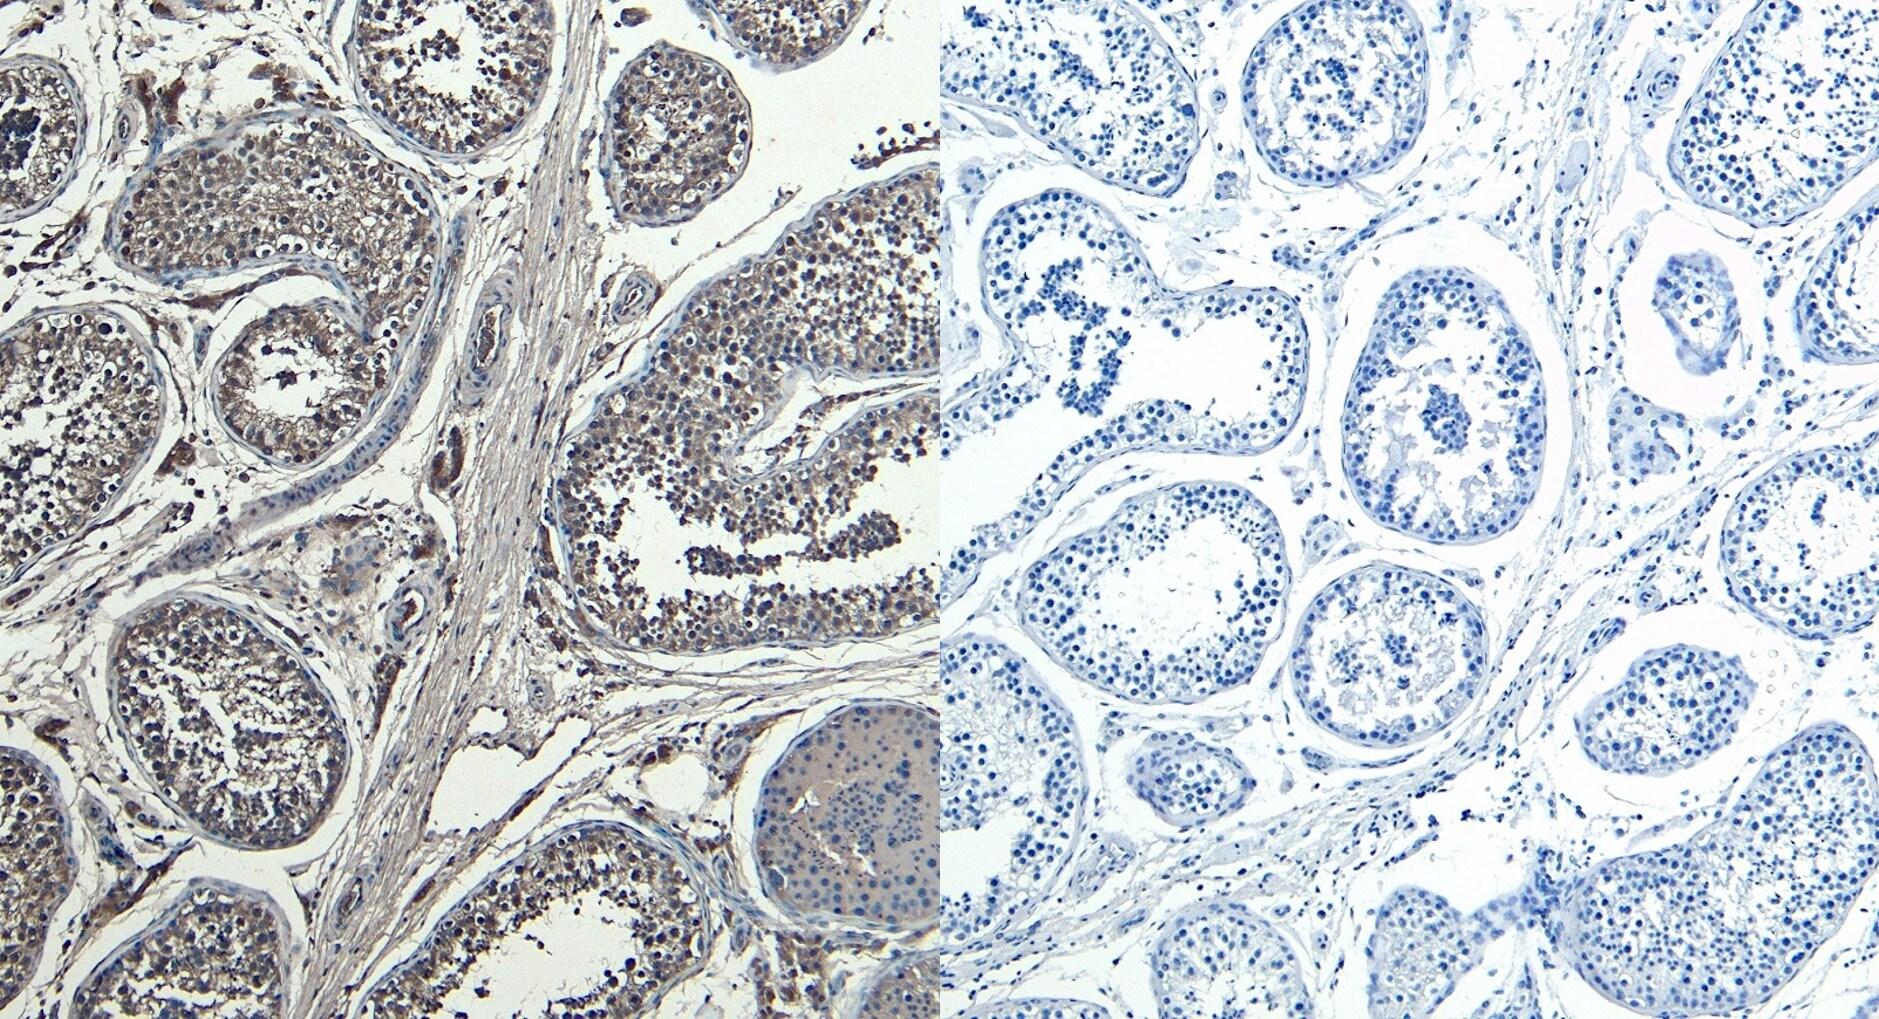 Immunohistochemistry (Formalin/PFA-fixed paraffin-embedded sections) - Anti-HOXA10 antibody (ab180222)